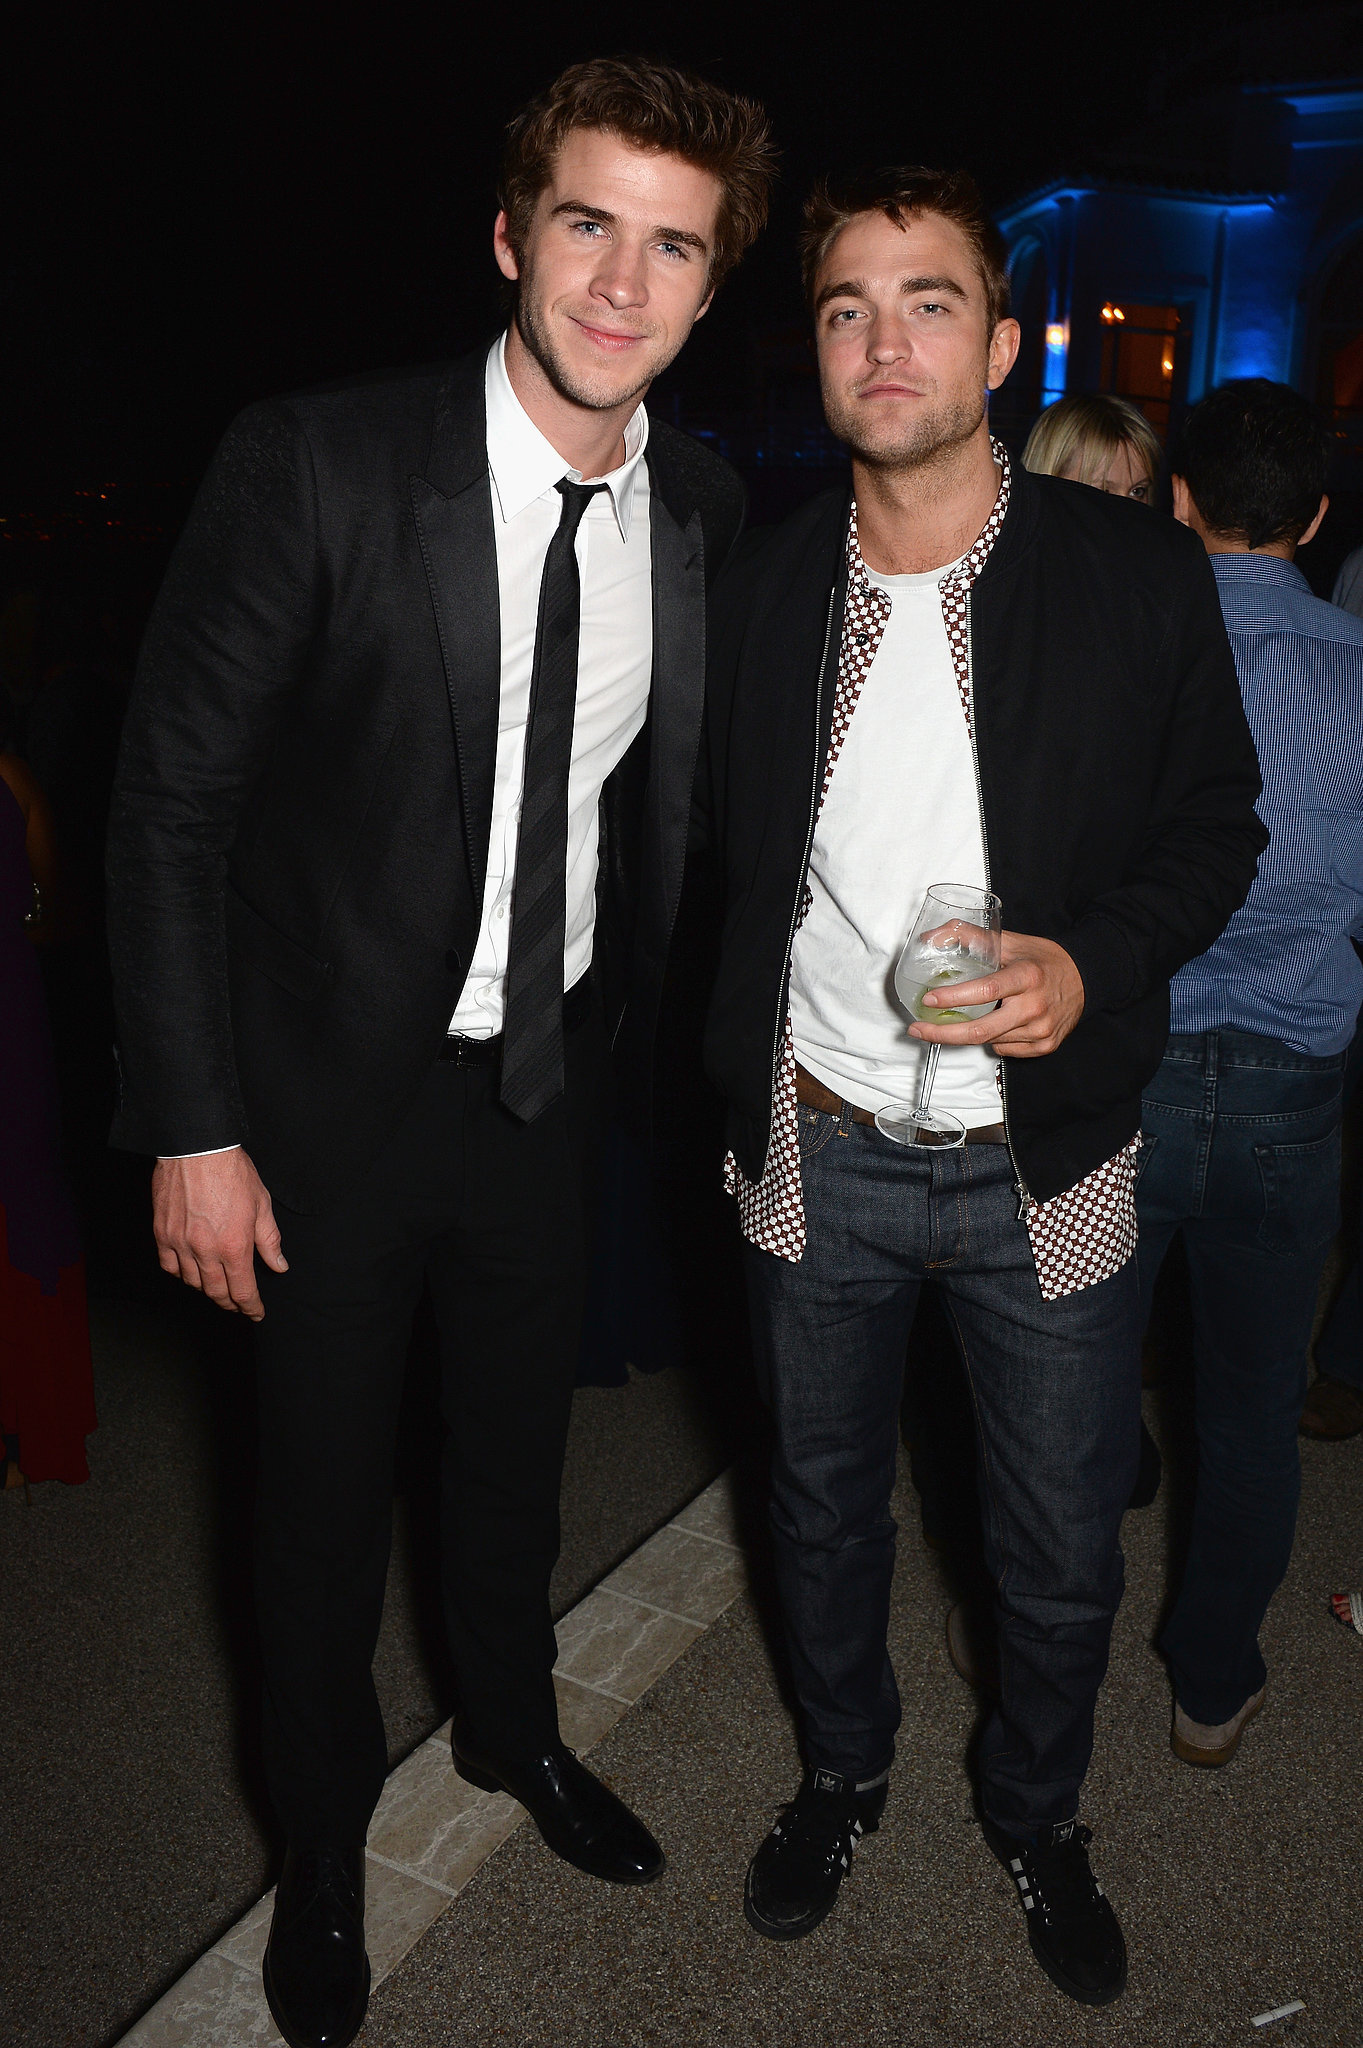 Robert Pattinson and Liam Hemsworth Let Loose at Vanity Fair's Cannes Bash